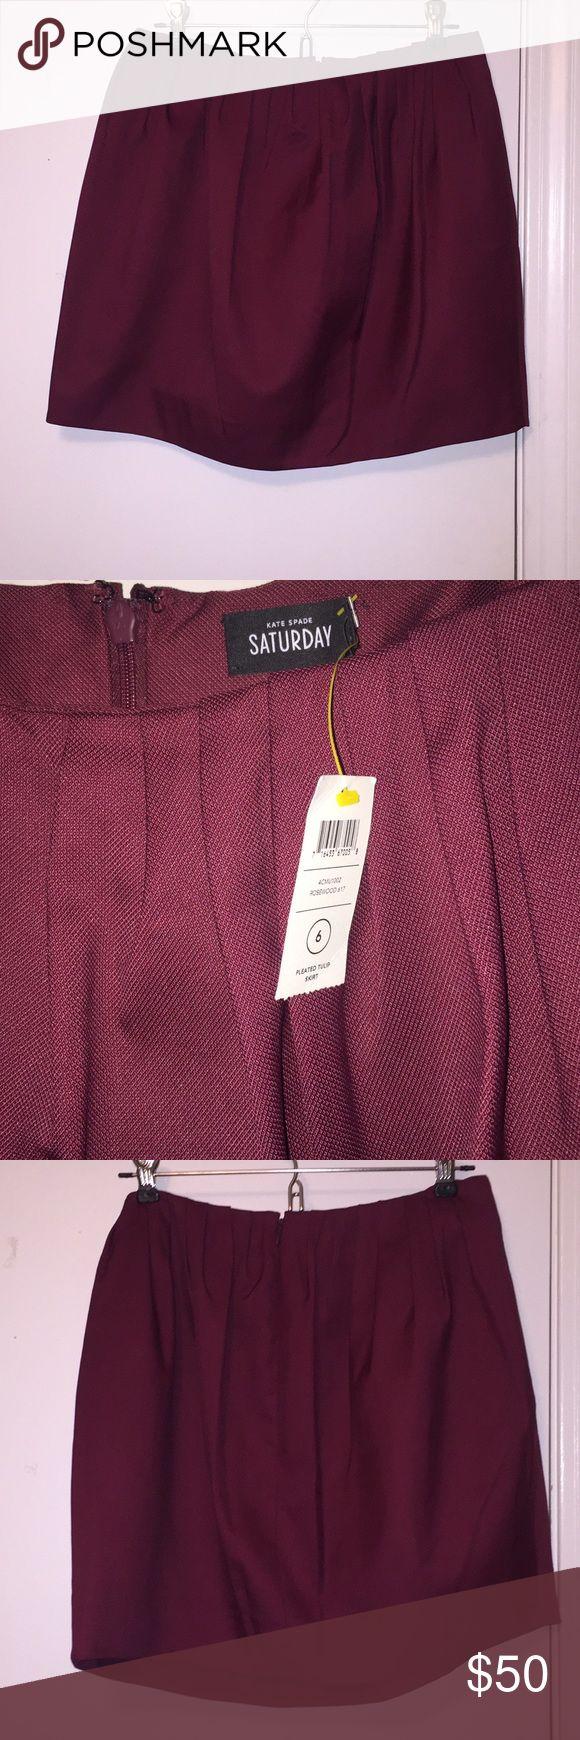 NWT Kate Spade Saturday Skirt NWT Kate Spade Saturday Burgundy Tulip Skirt, size 6 Kate Spade Saturday Skirts